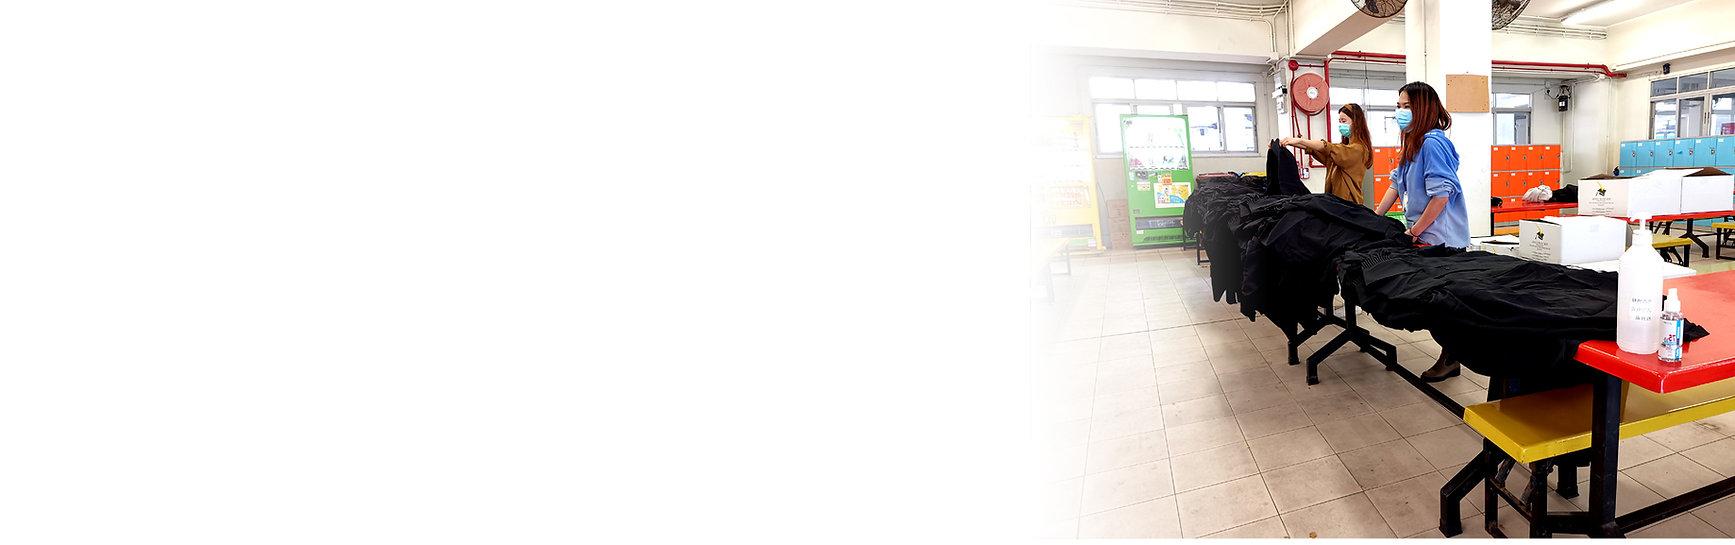 大學畢業袍、中學畢業袍、小學畢業袍、畢業典禮學校行政支援、畢業袍設計 Applicable to : Academic Dress, Graduation Gown, University Academic Dress,Secondary School Academic Dress, Primary School Academic Dress, Graduation Ceremony Administrative Support